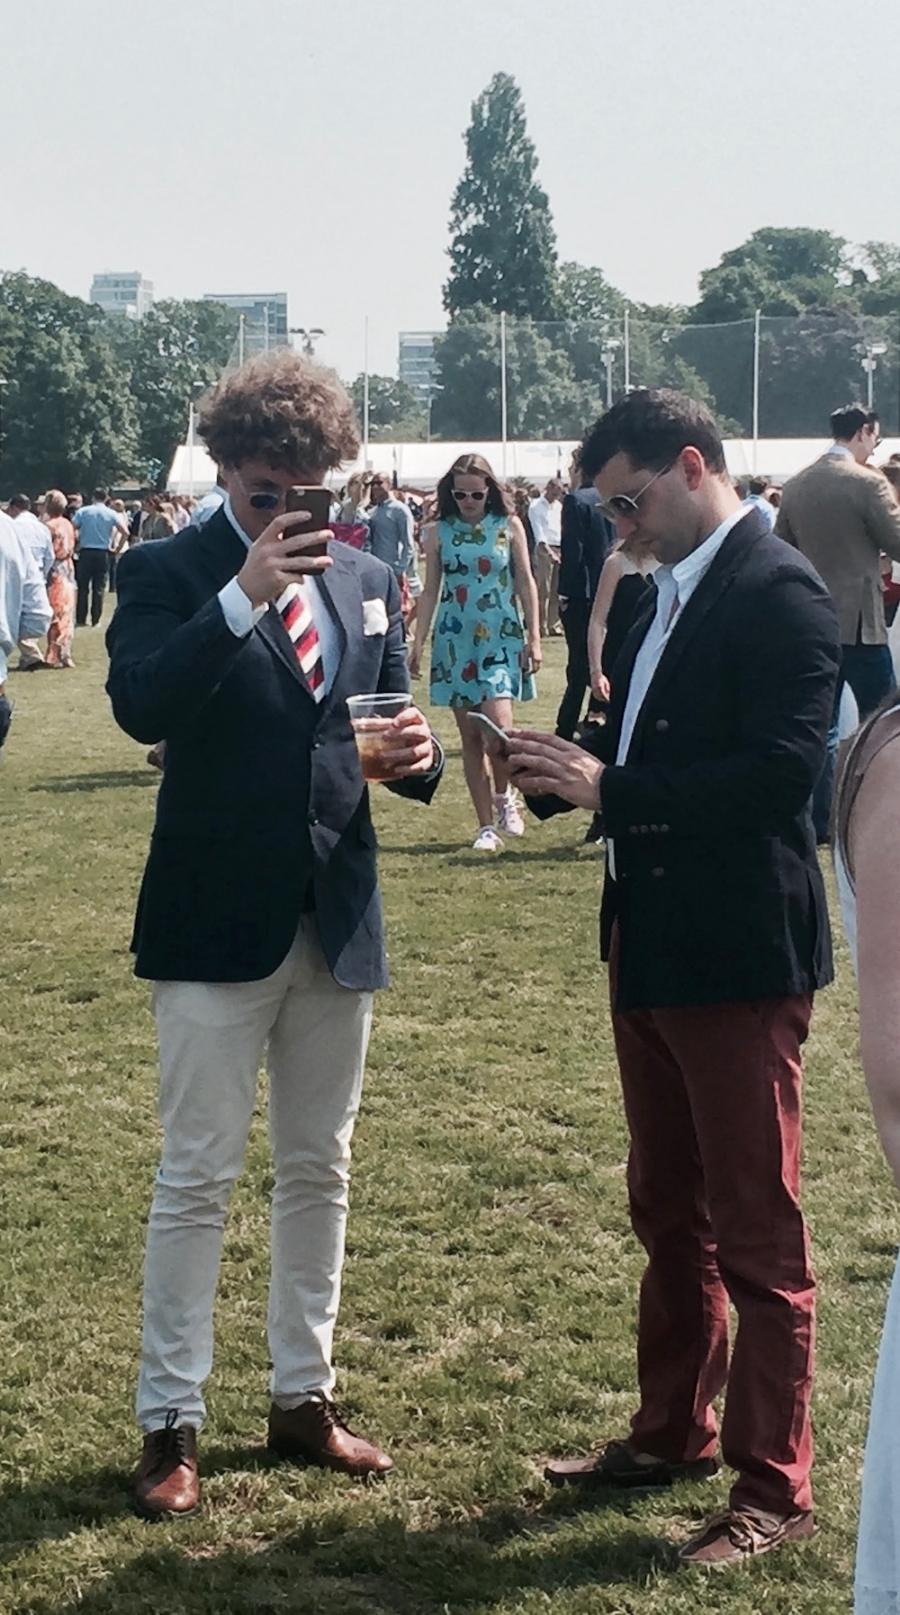 Stylish men at Polo, London